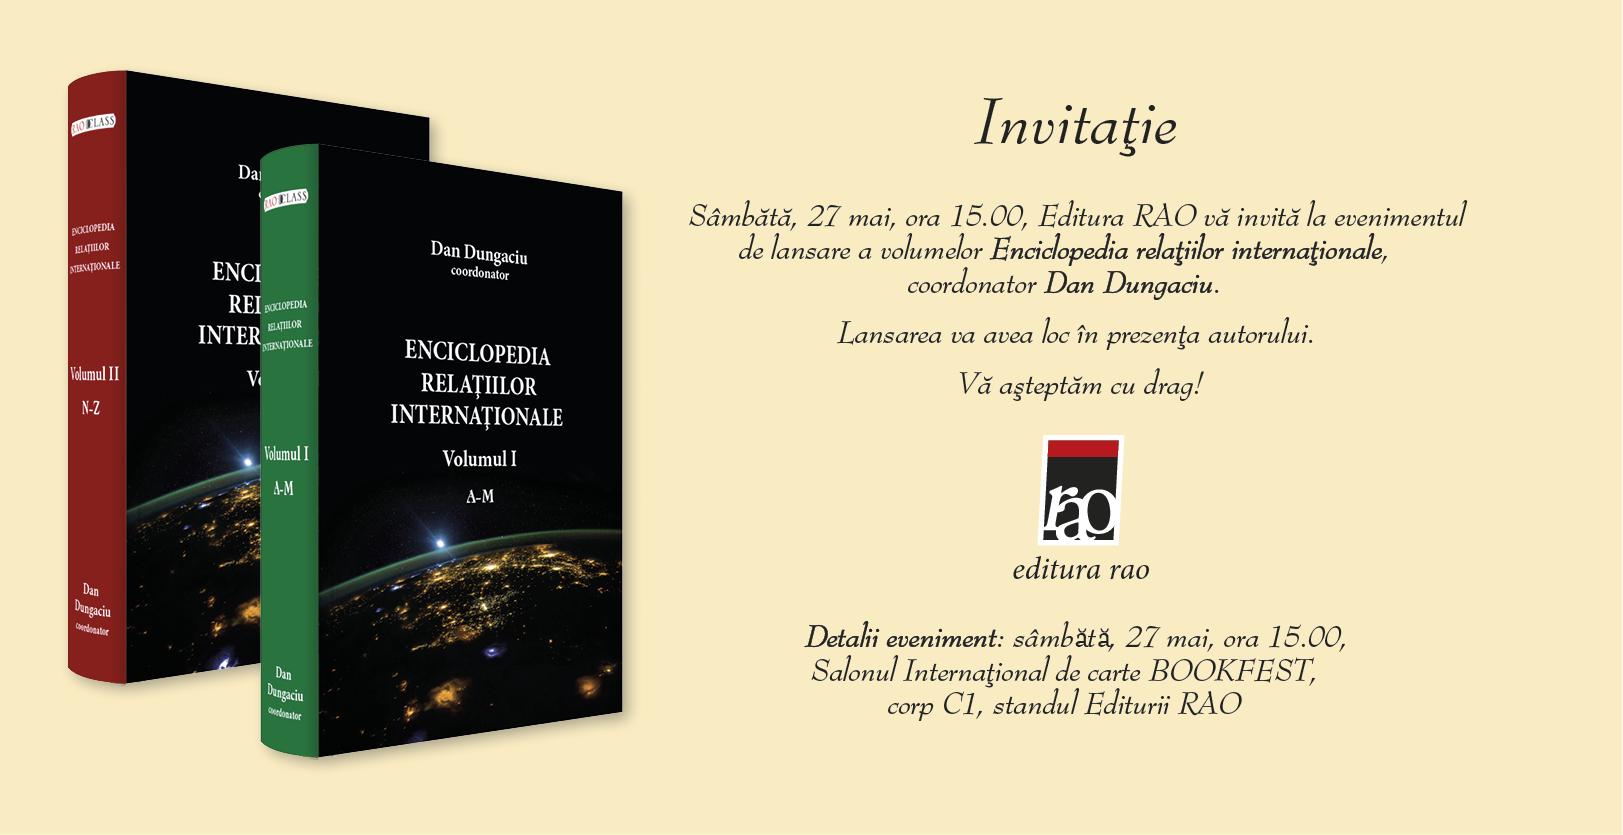 Invitatie Enciclopedia Relatiilor Internationale (1)